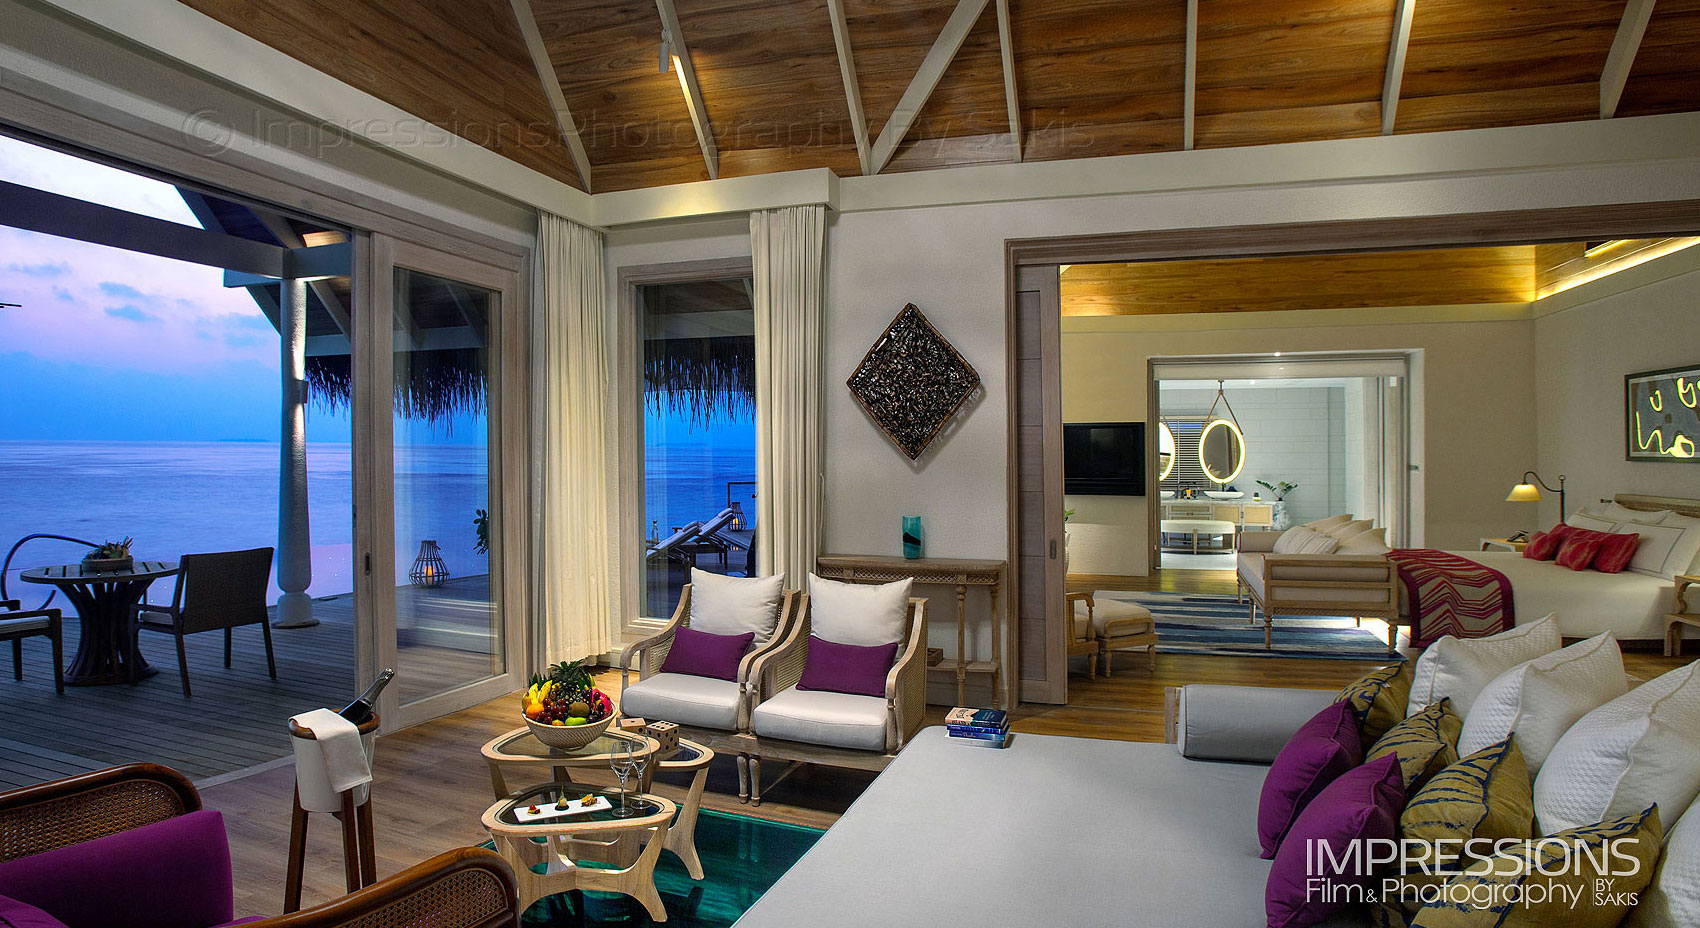 Interior Hotel Photography. Hotels Resorts Photography Luxury Villa  Photography